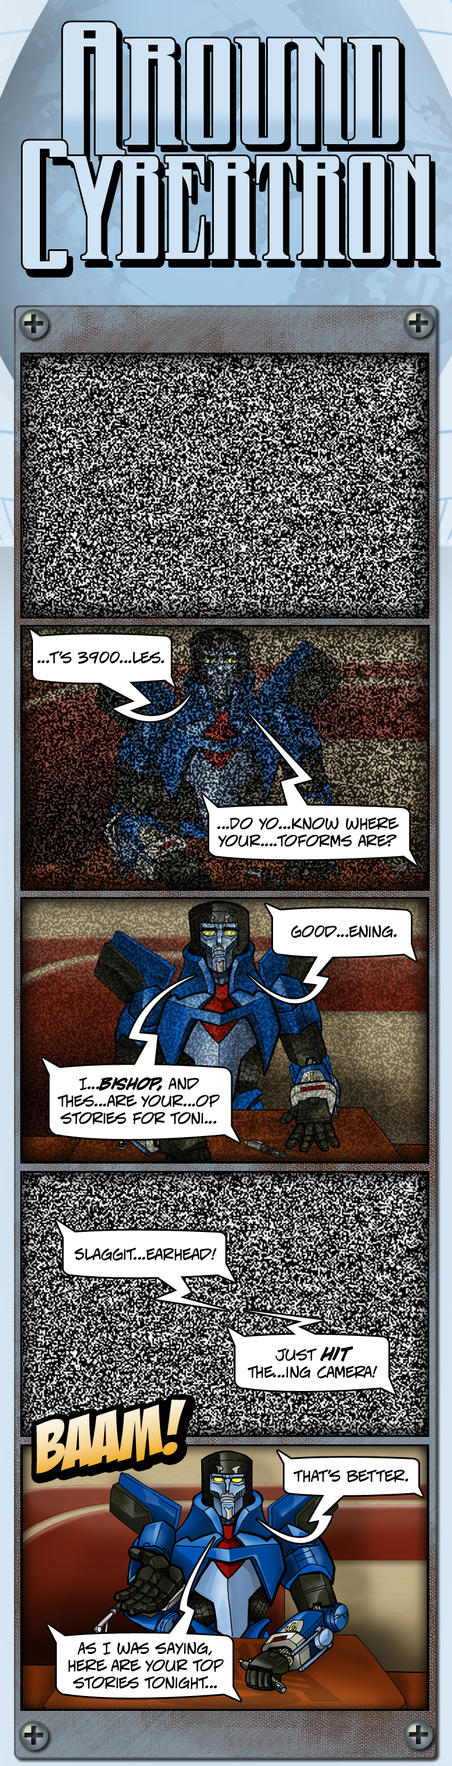 Around Cybertron Part 9 by RID-NightViper